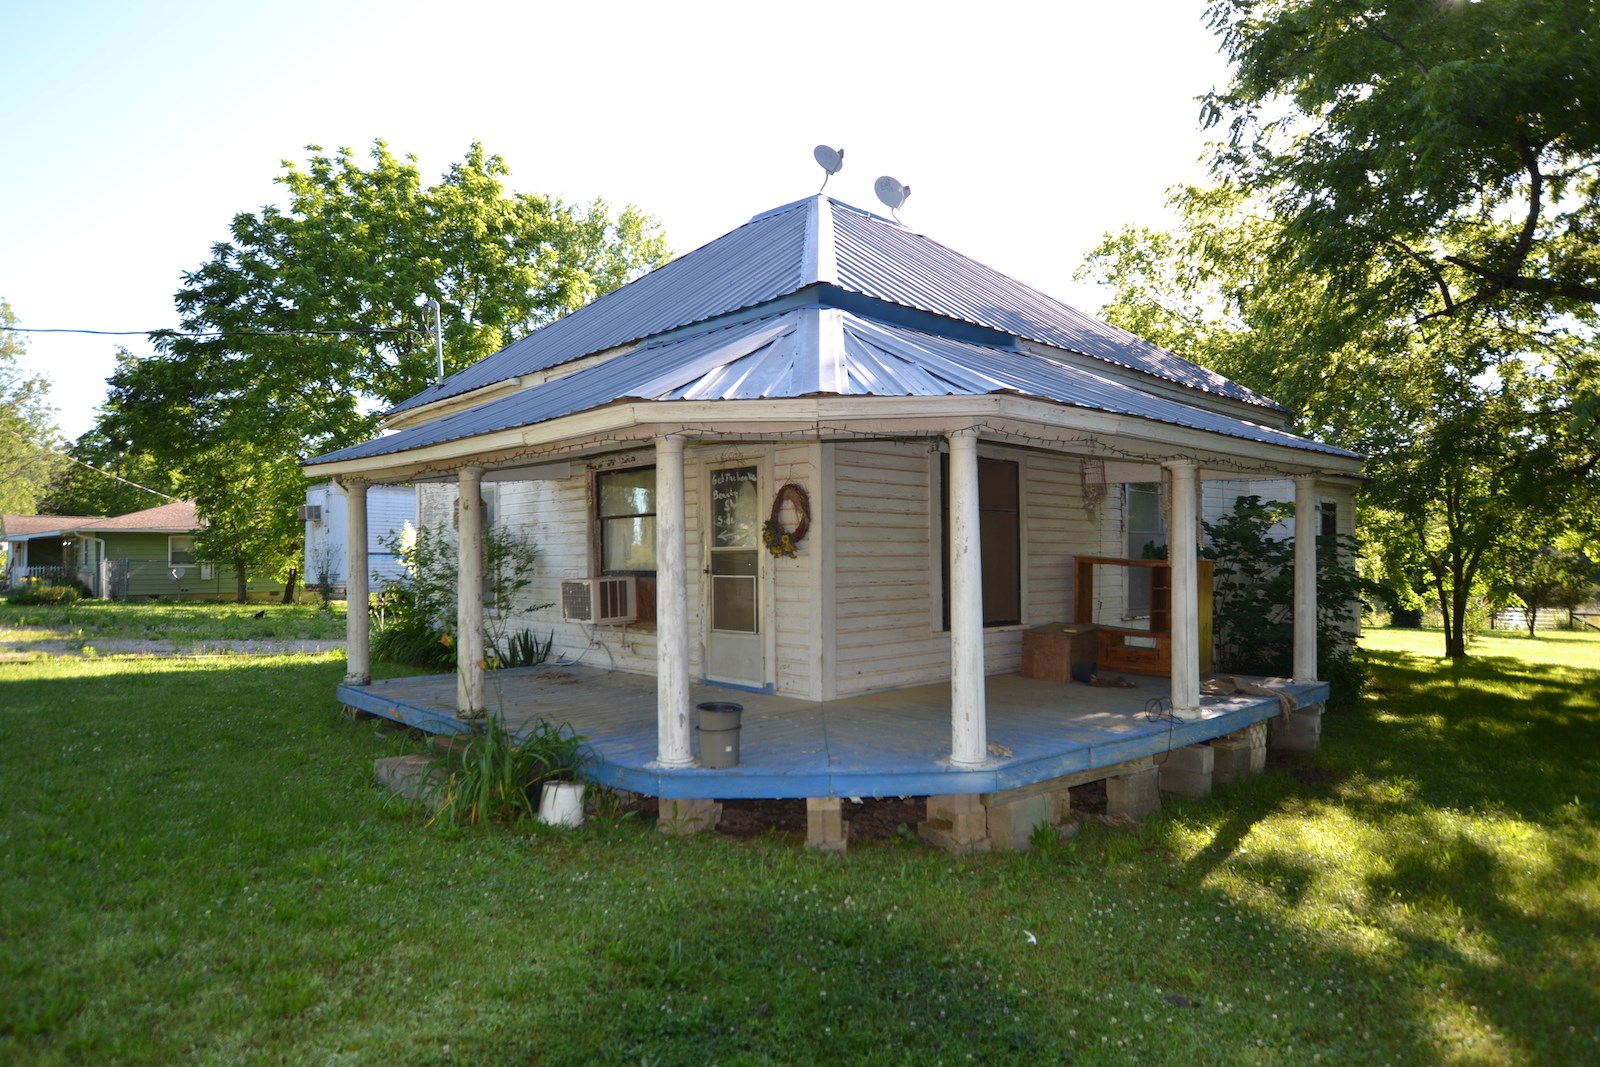 Farmhouse in Town for Sale - Shannon County, Missouri